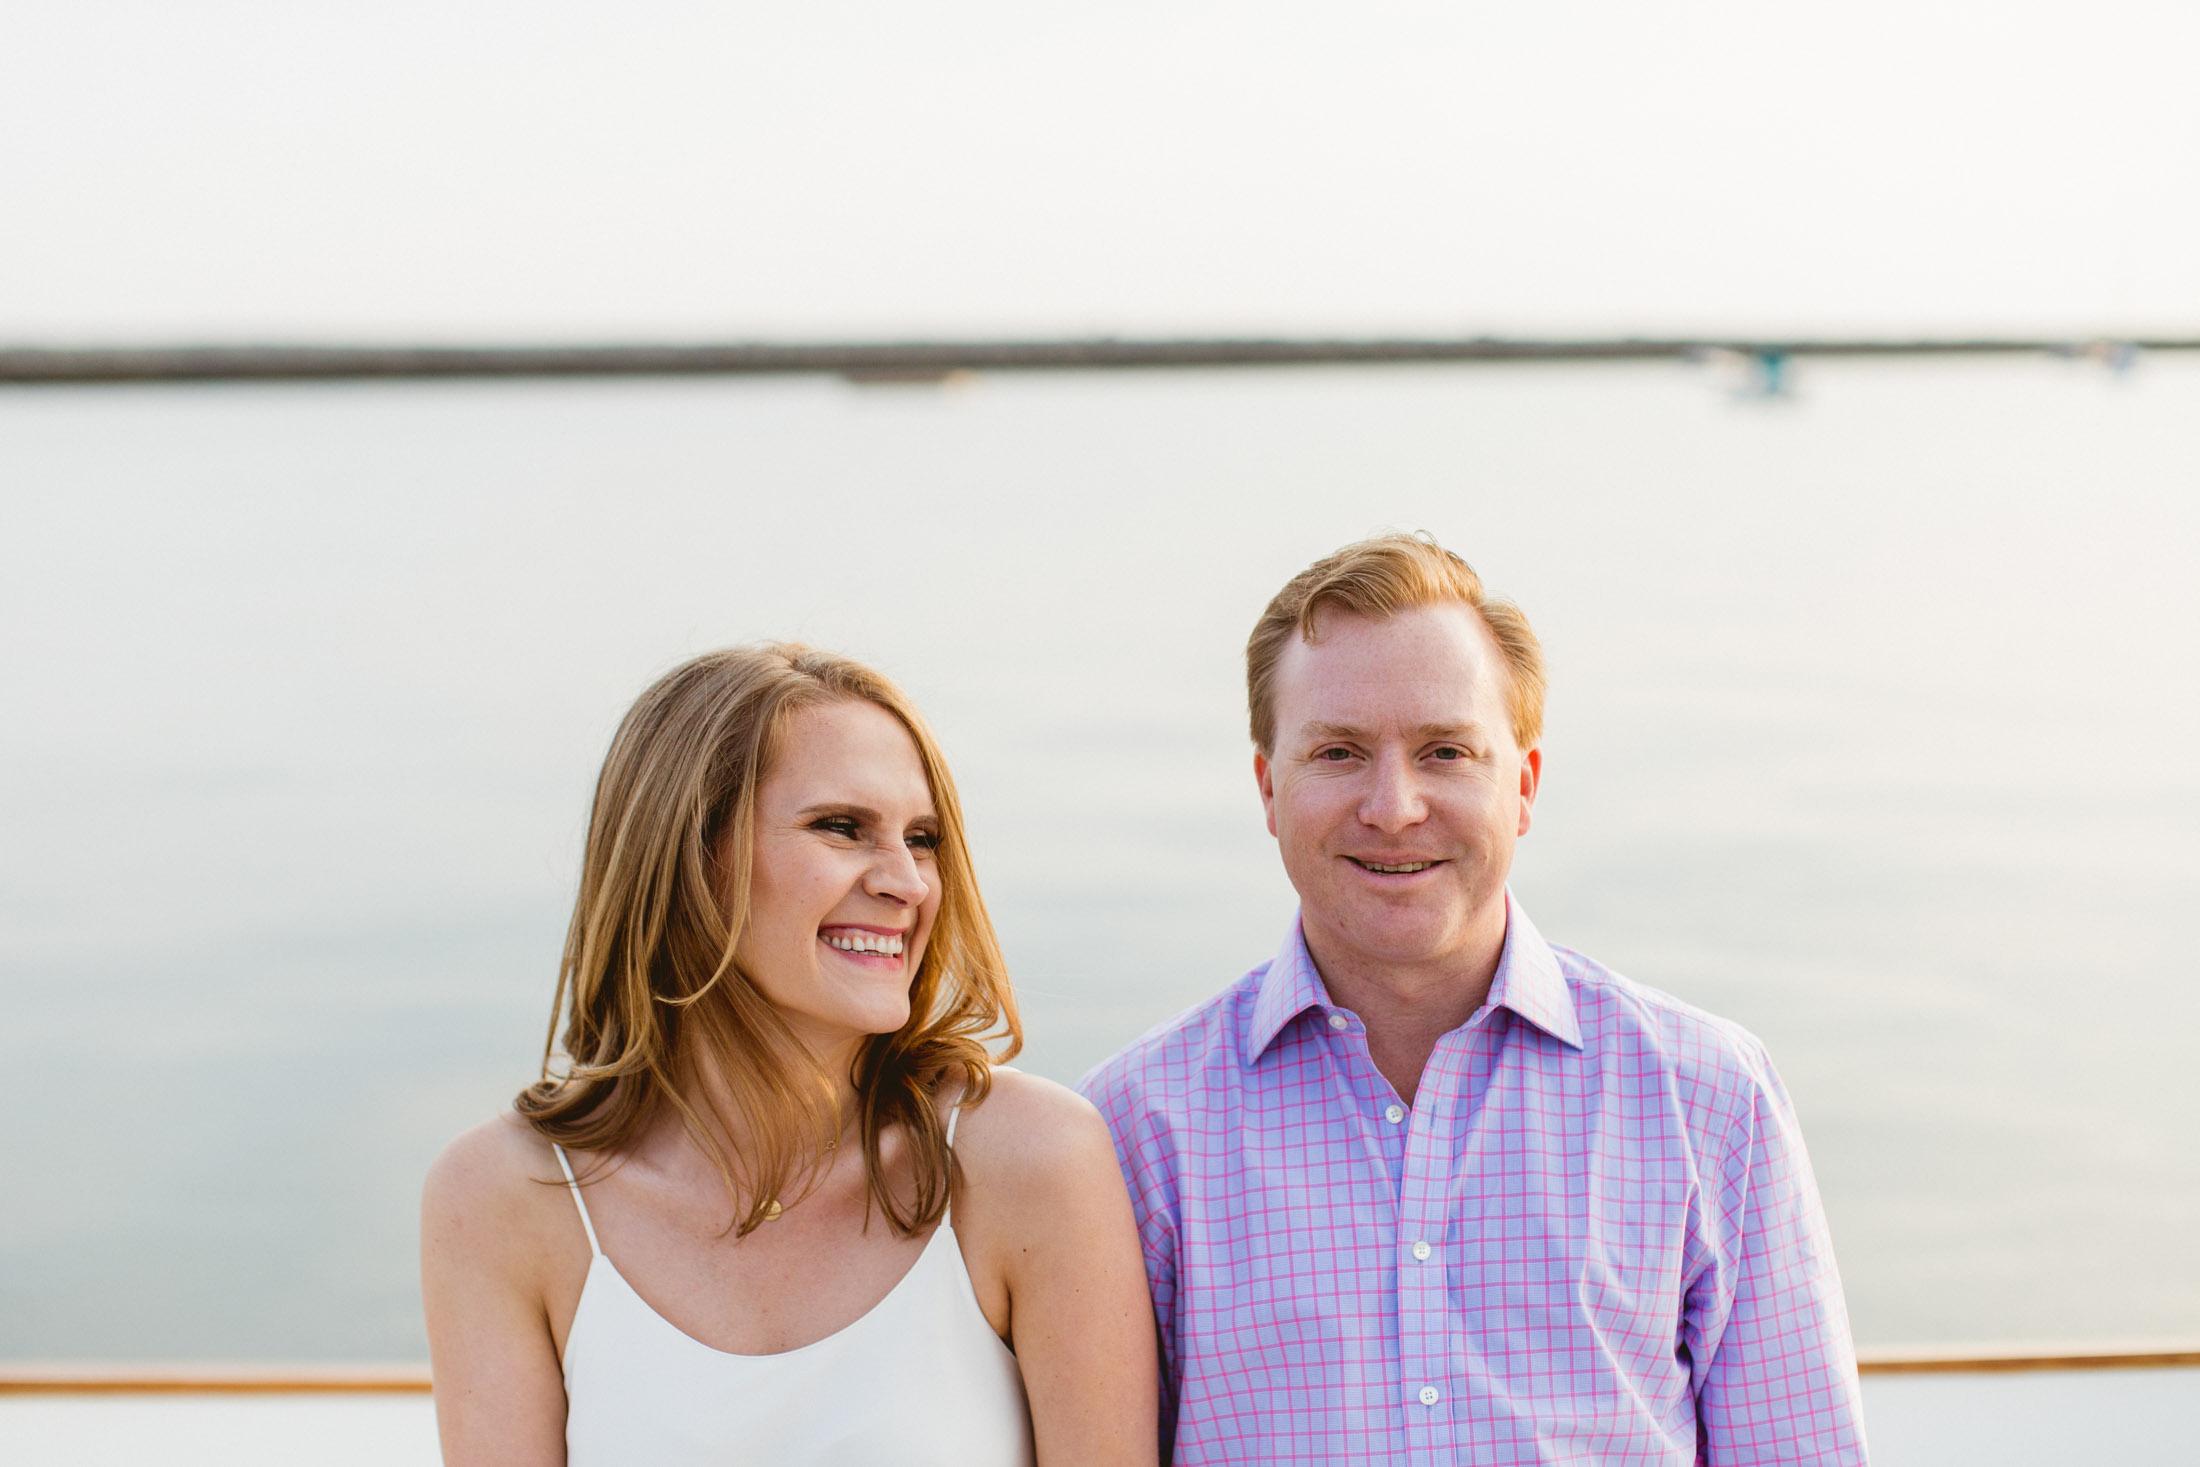 Eastern-Point-yacht-Club-Engagement-3.jpg